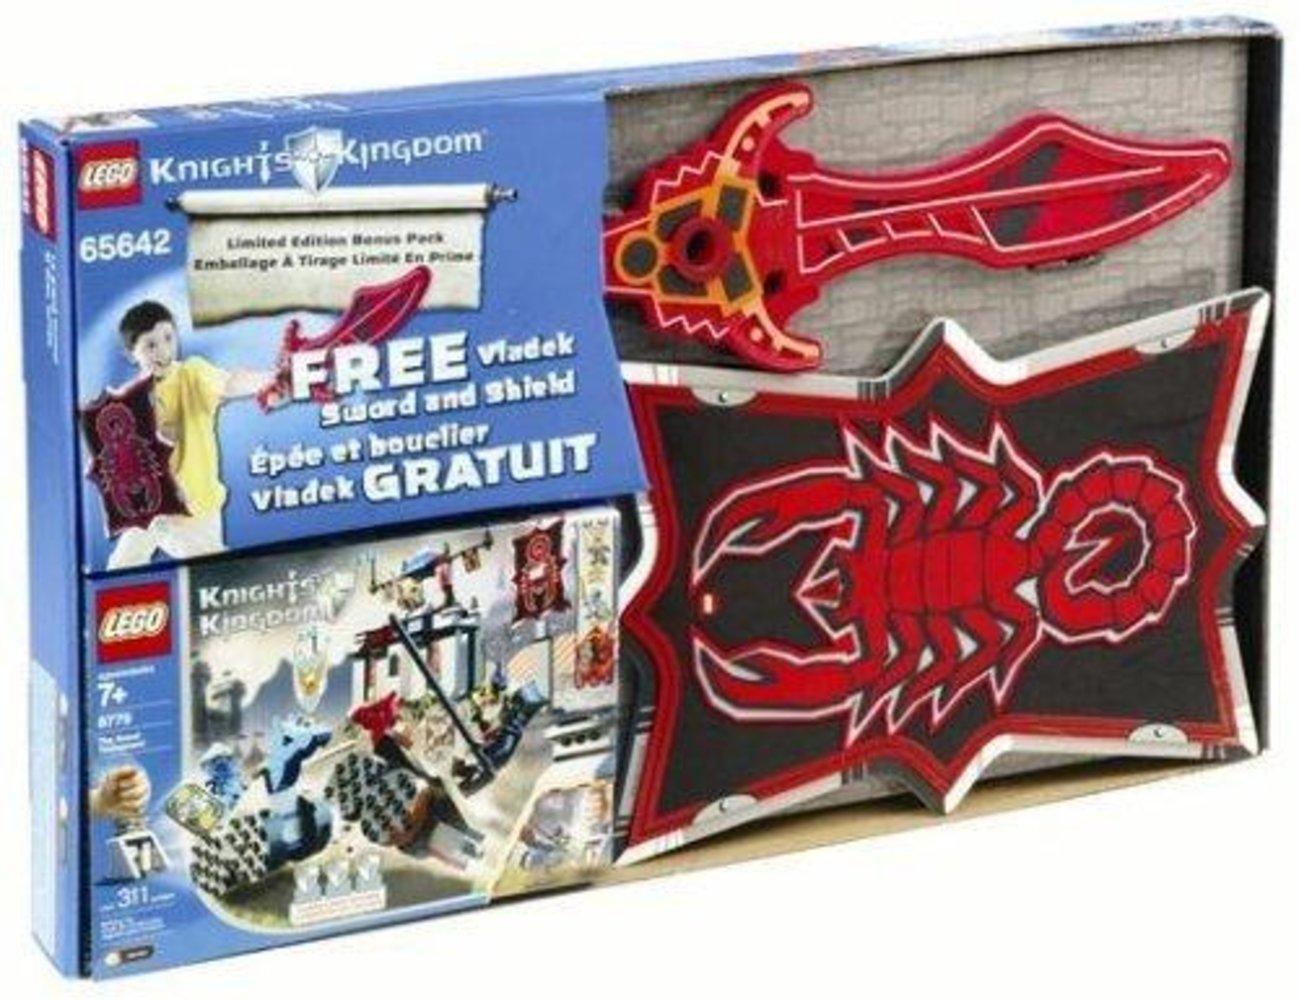 The Grand Tournament Limited Edition Bonus Pack